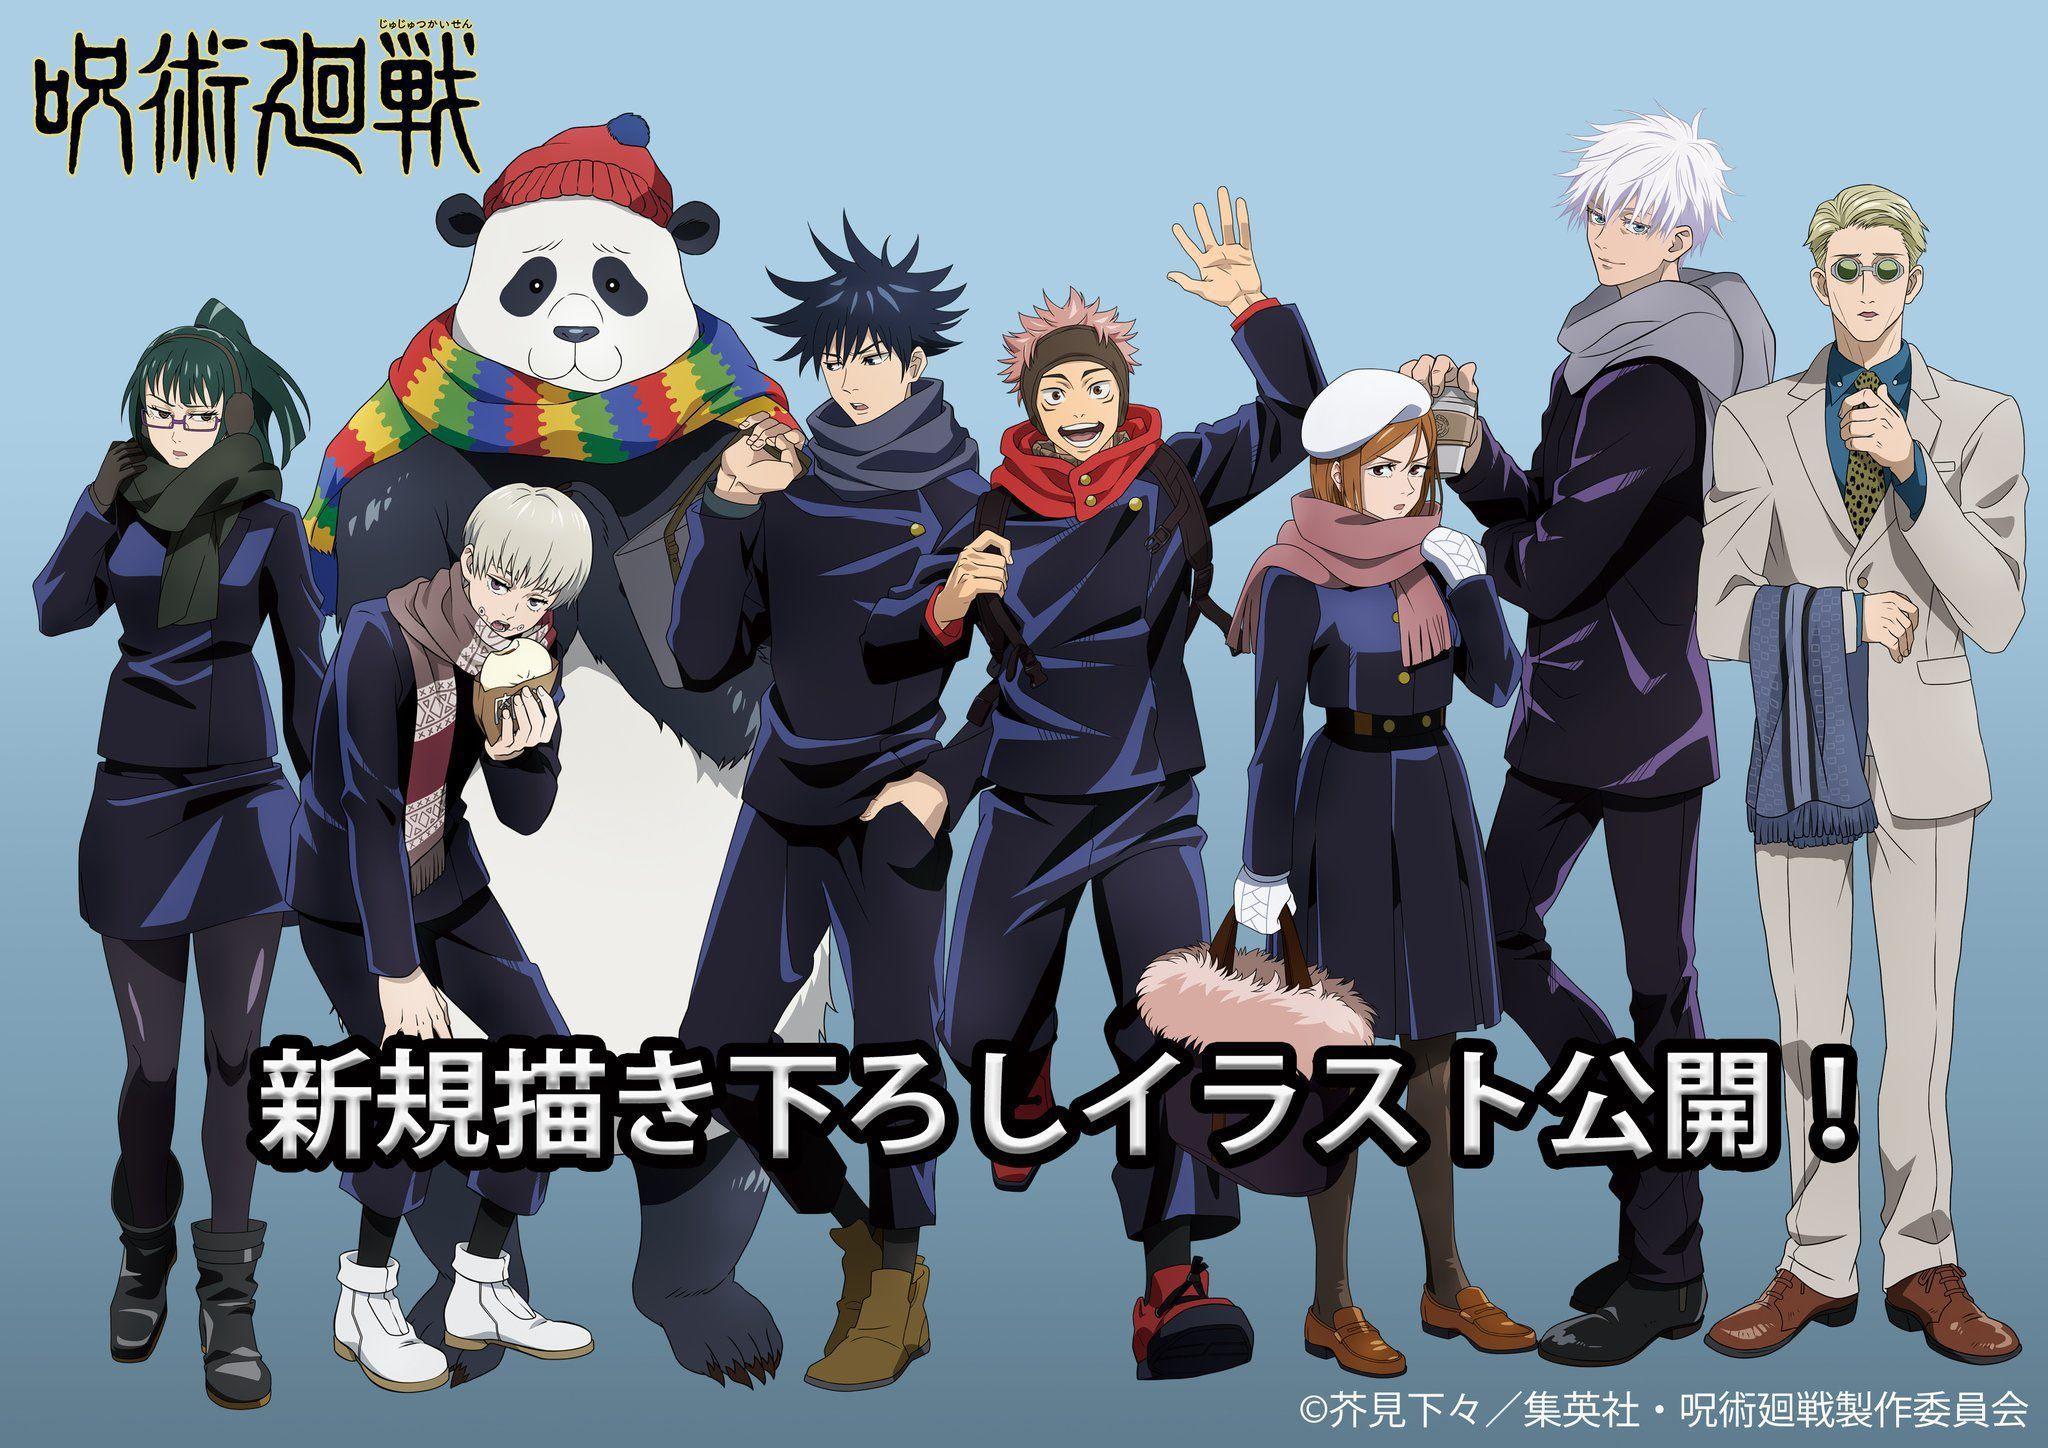 Vy On Twitter Jujutsu Anime Aesthetic Anime